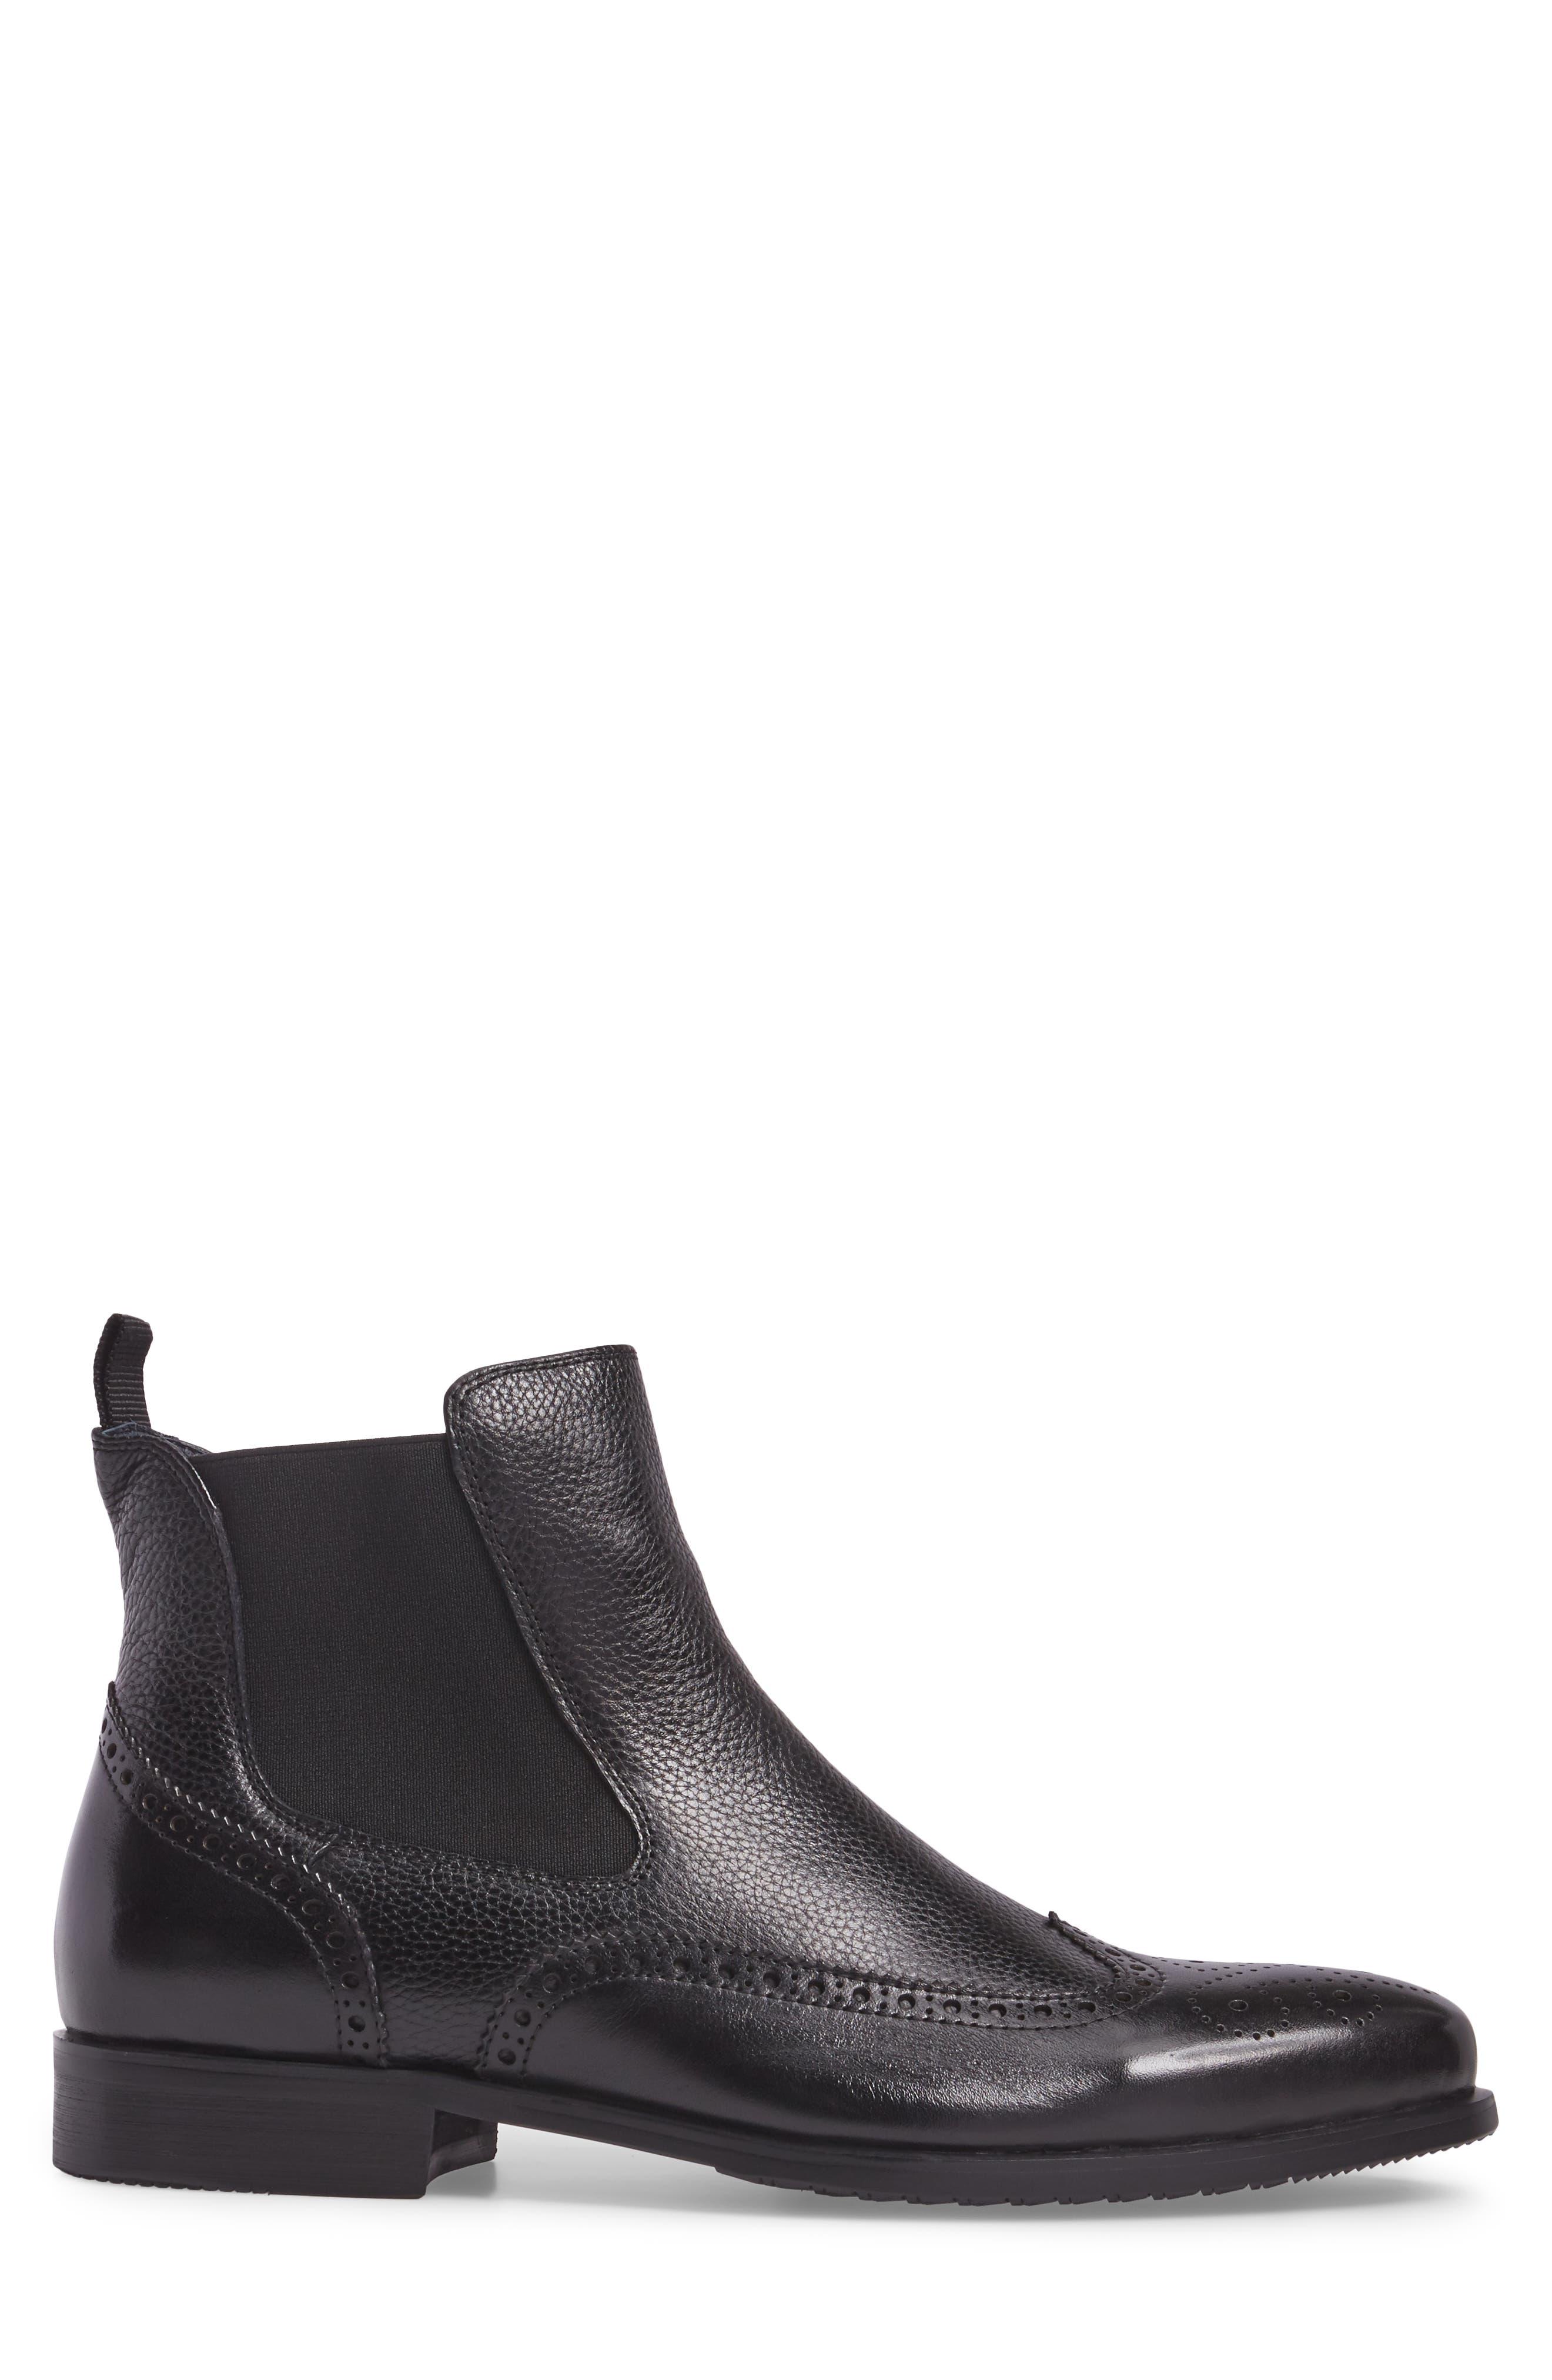 Hamel Chelsea Boot,                             Alternate thumbnail 3, color,                             Black Leather